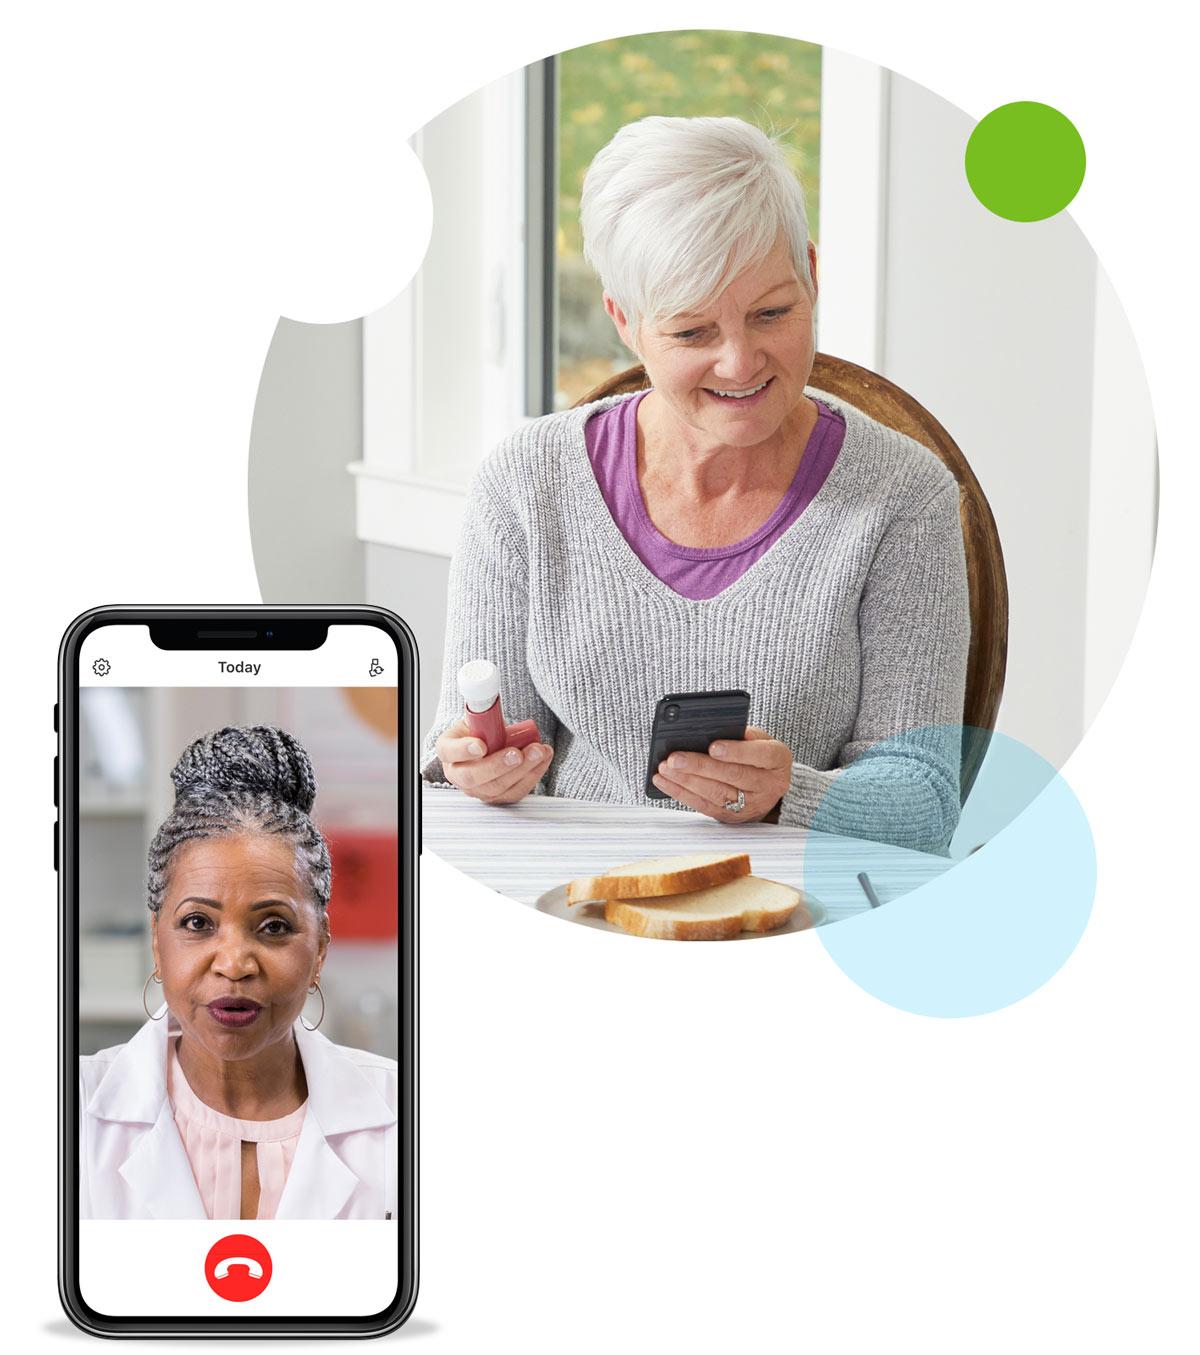 woman-on-telemedicine-call